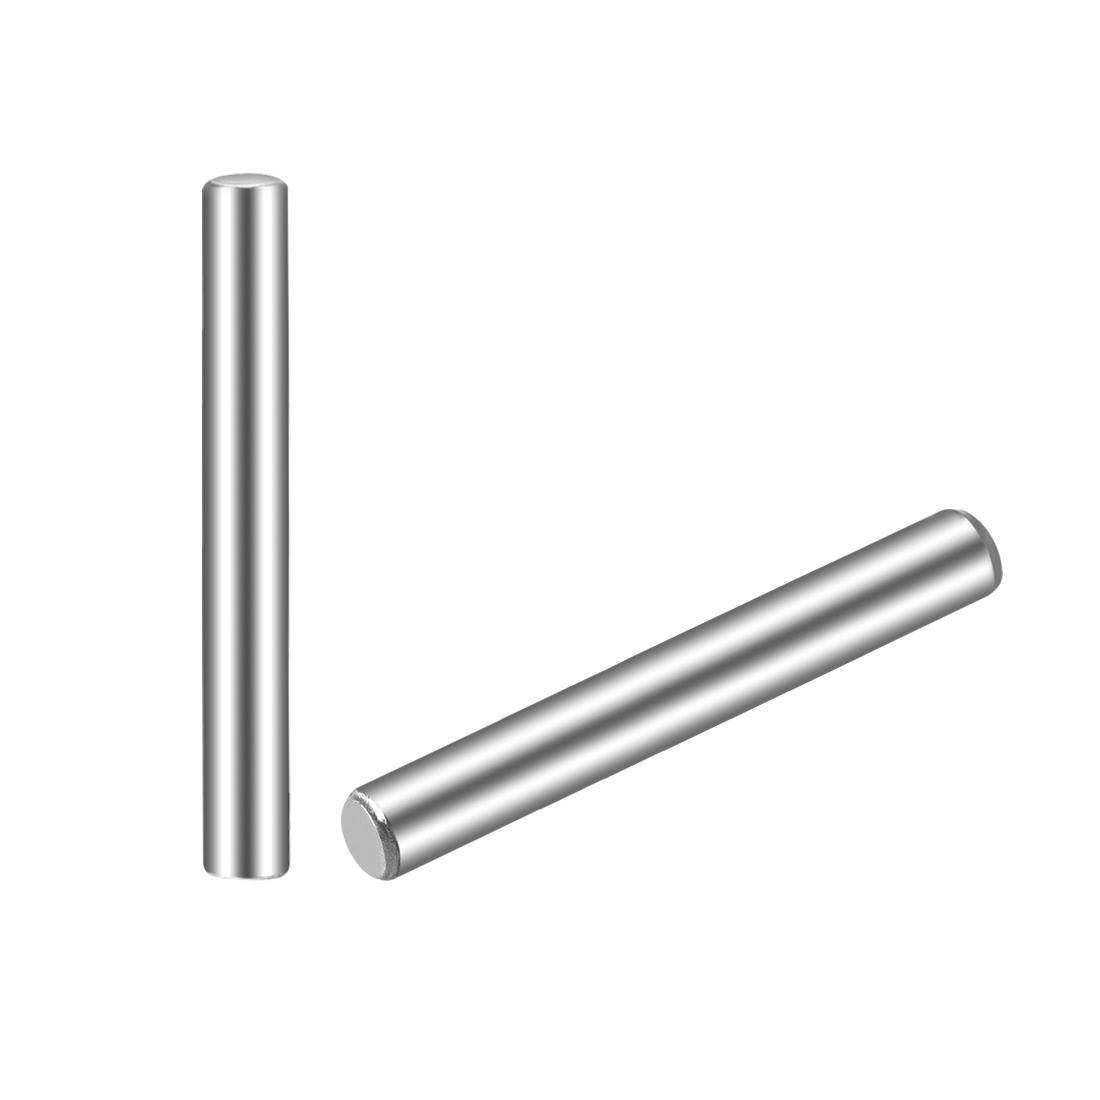 25Pcs 2.5mm x 20mm Dowel Pin 304 Stainless Steel Shelf Support Pin Fasten